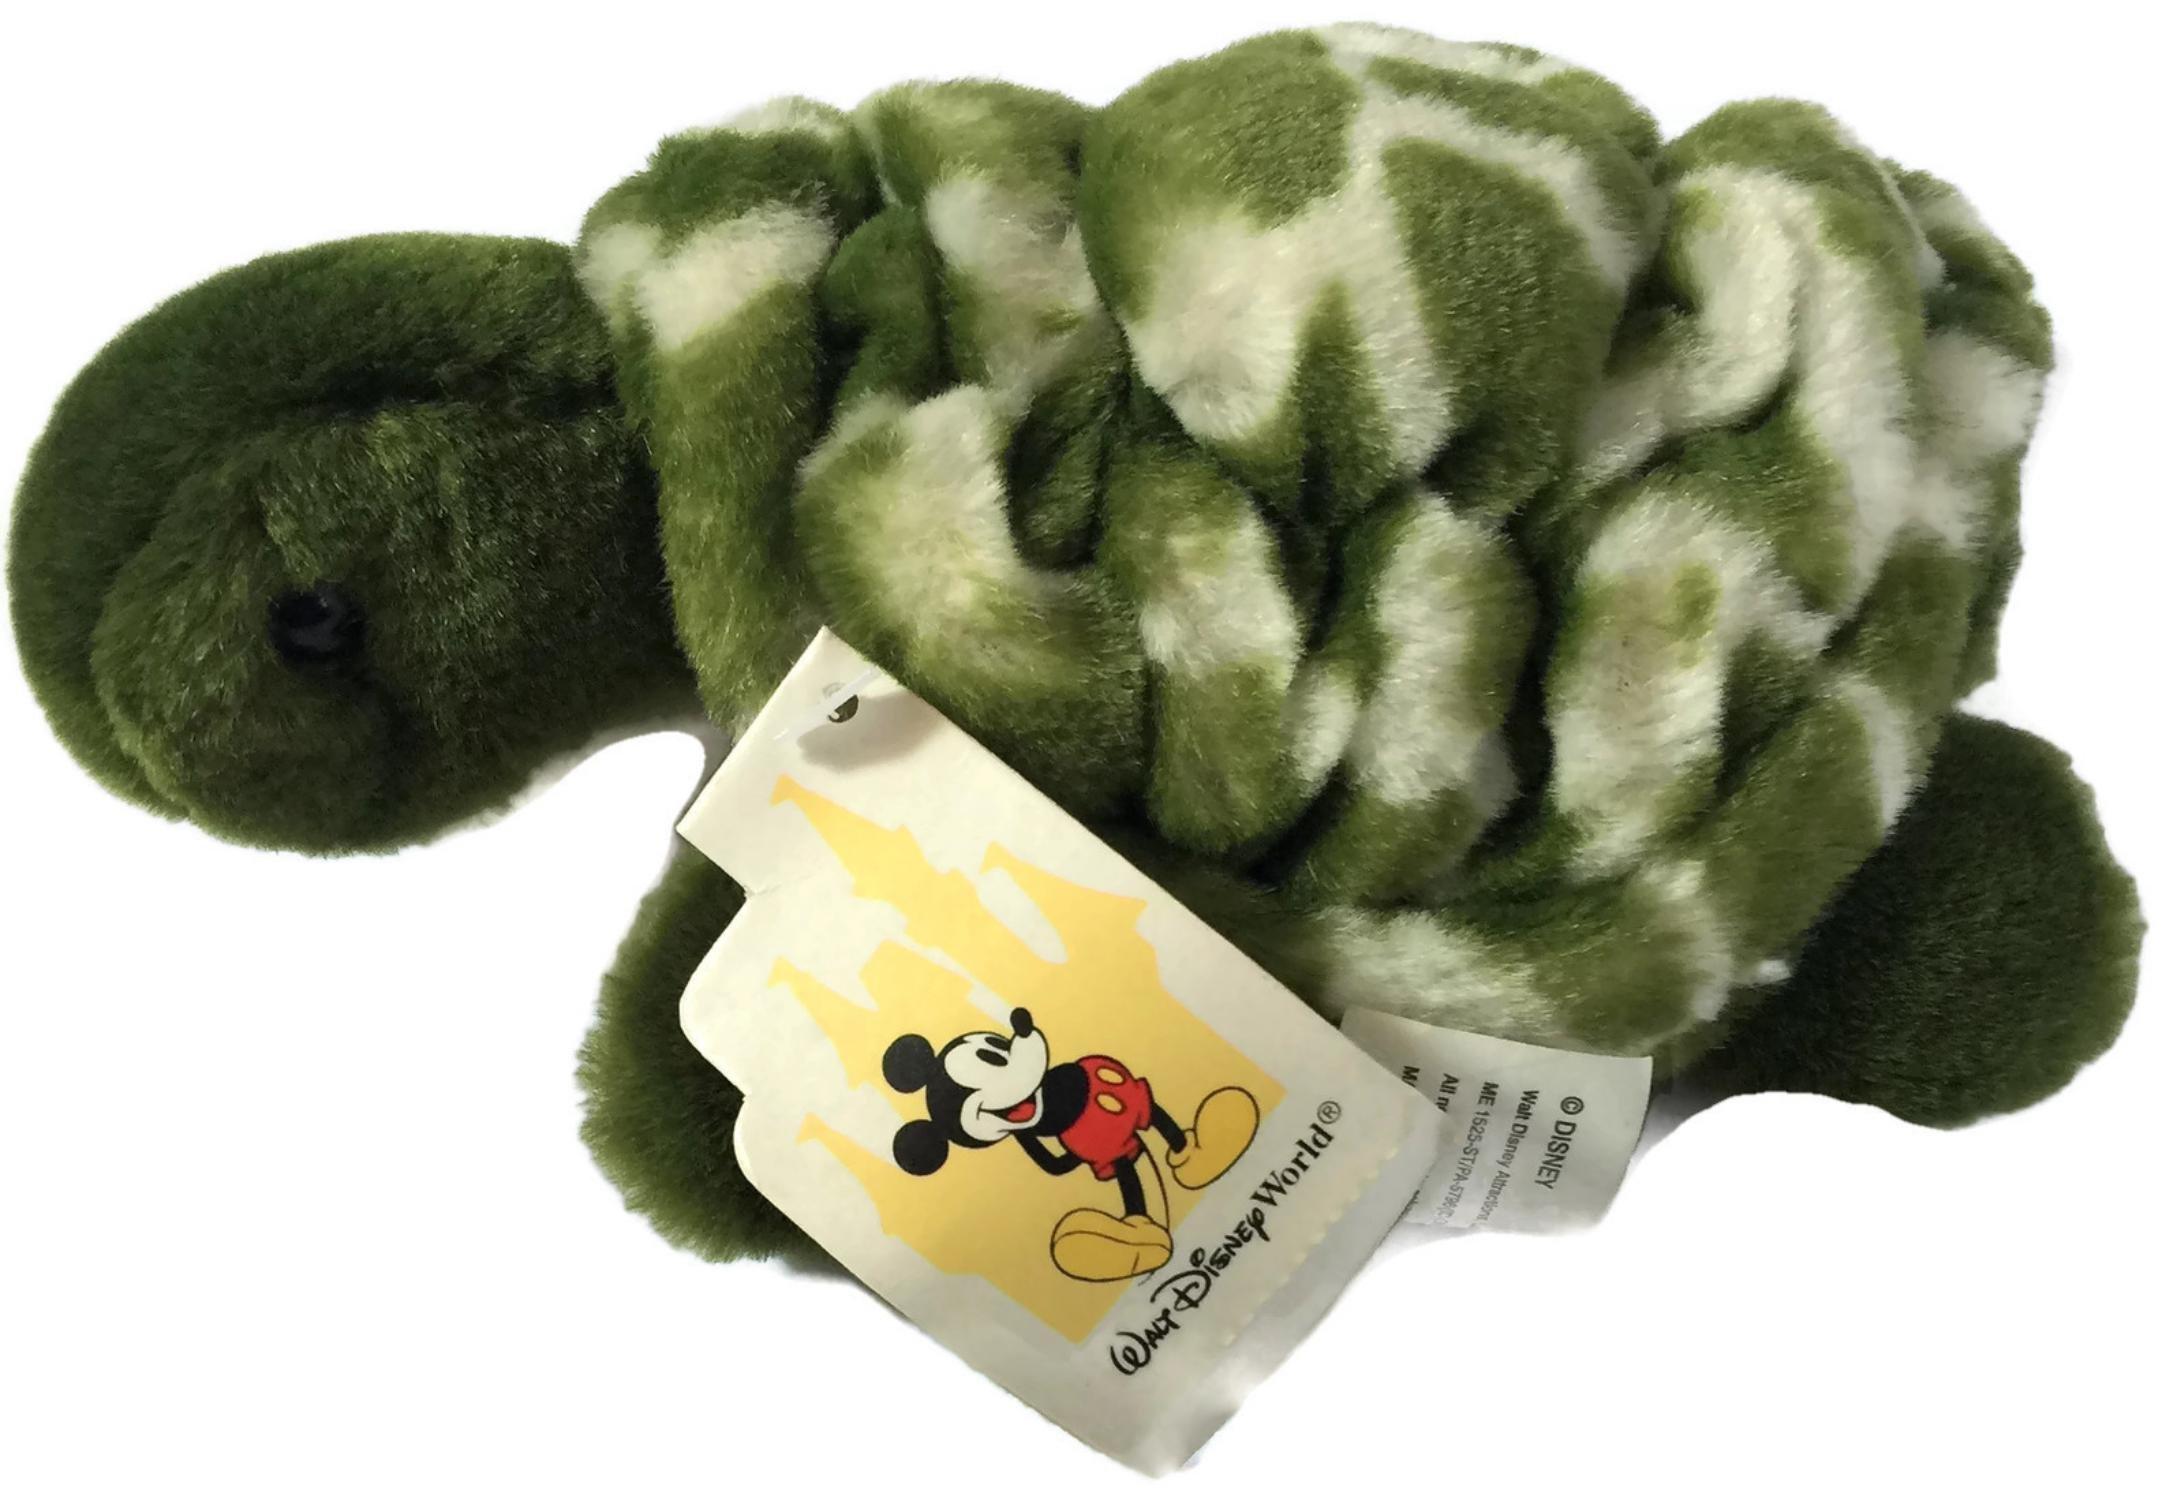 Disney's Living Seas Epcot Green Sea Turtle Plush Stuffed Animal 7''